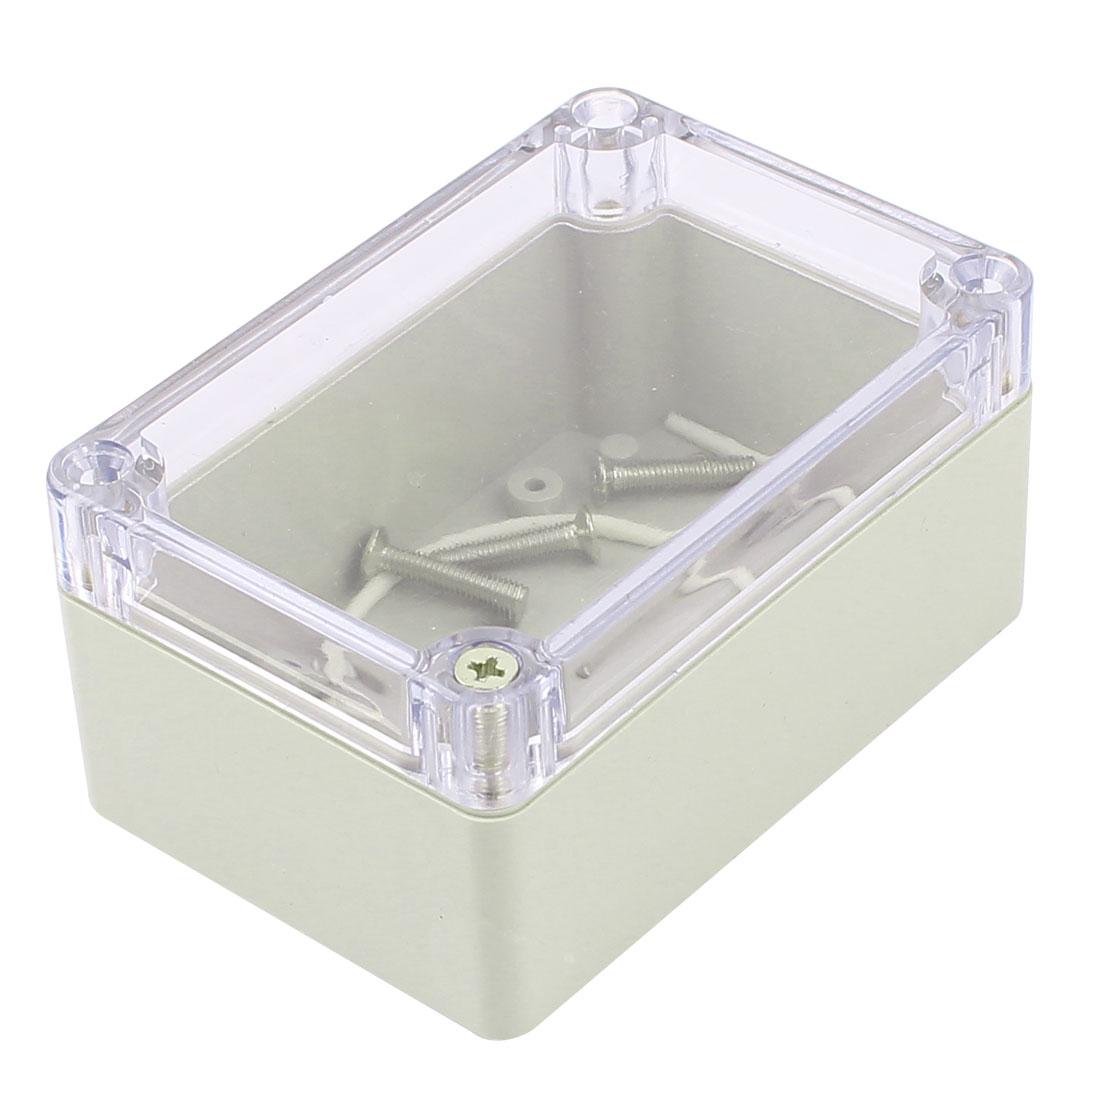 Plastic Enclosure Waterproof Clear Project Box Case 100x68x50mm